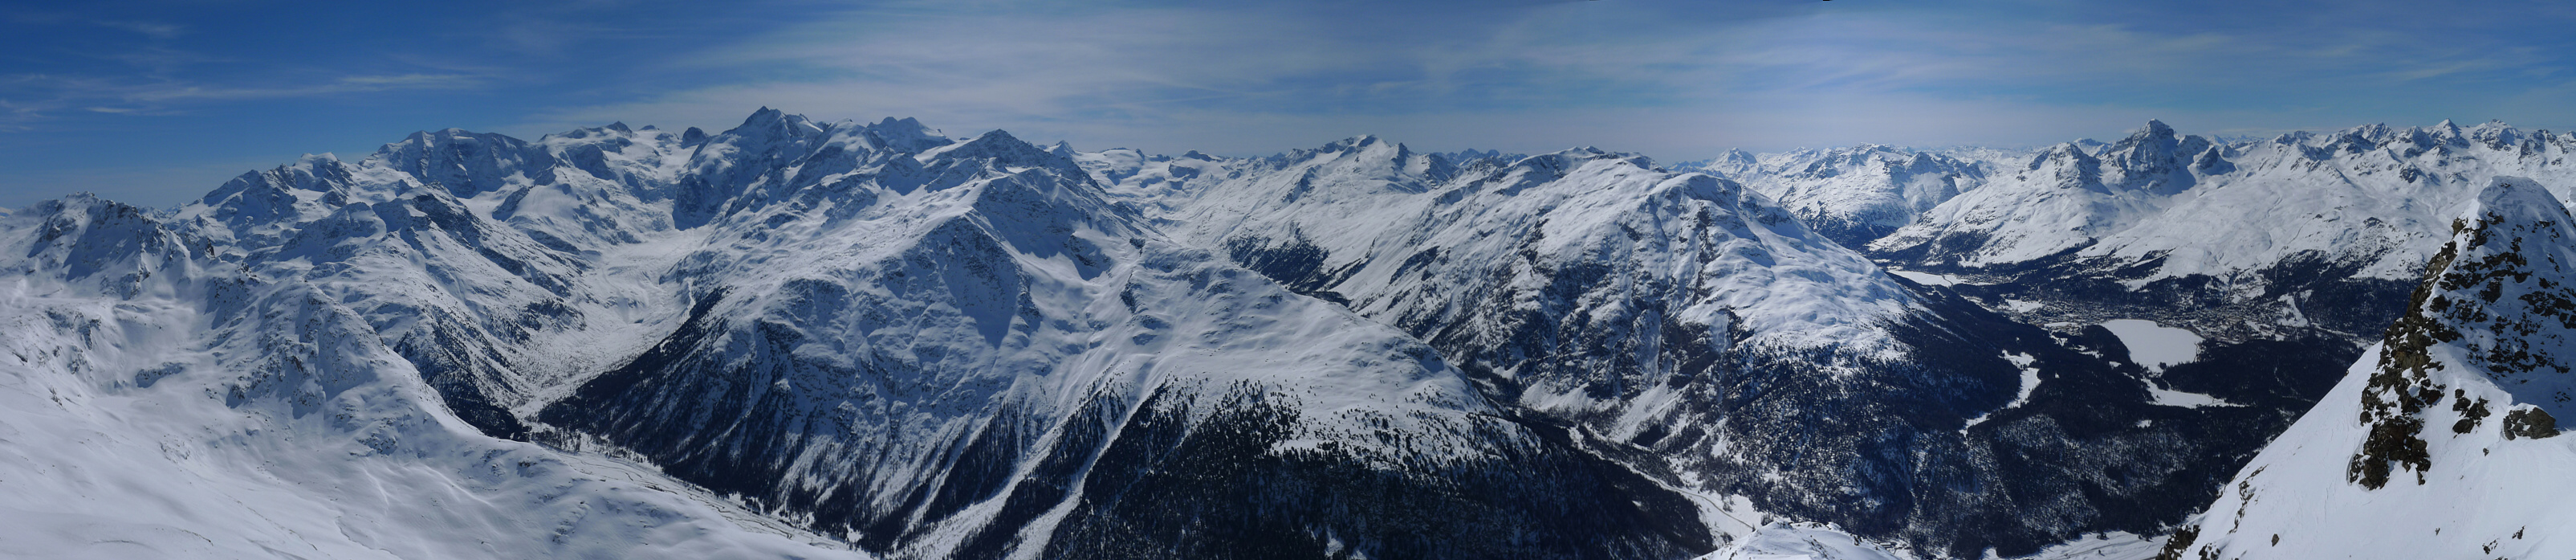 Piz Muragl Albula Alpen Švýcarsko panorama 39